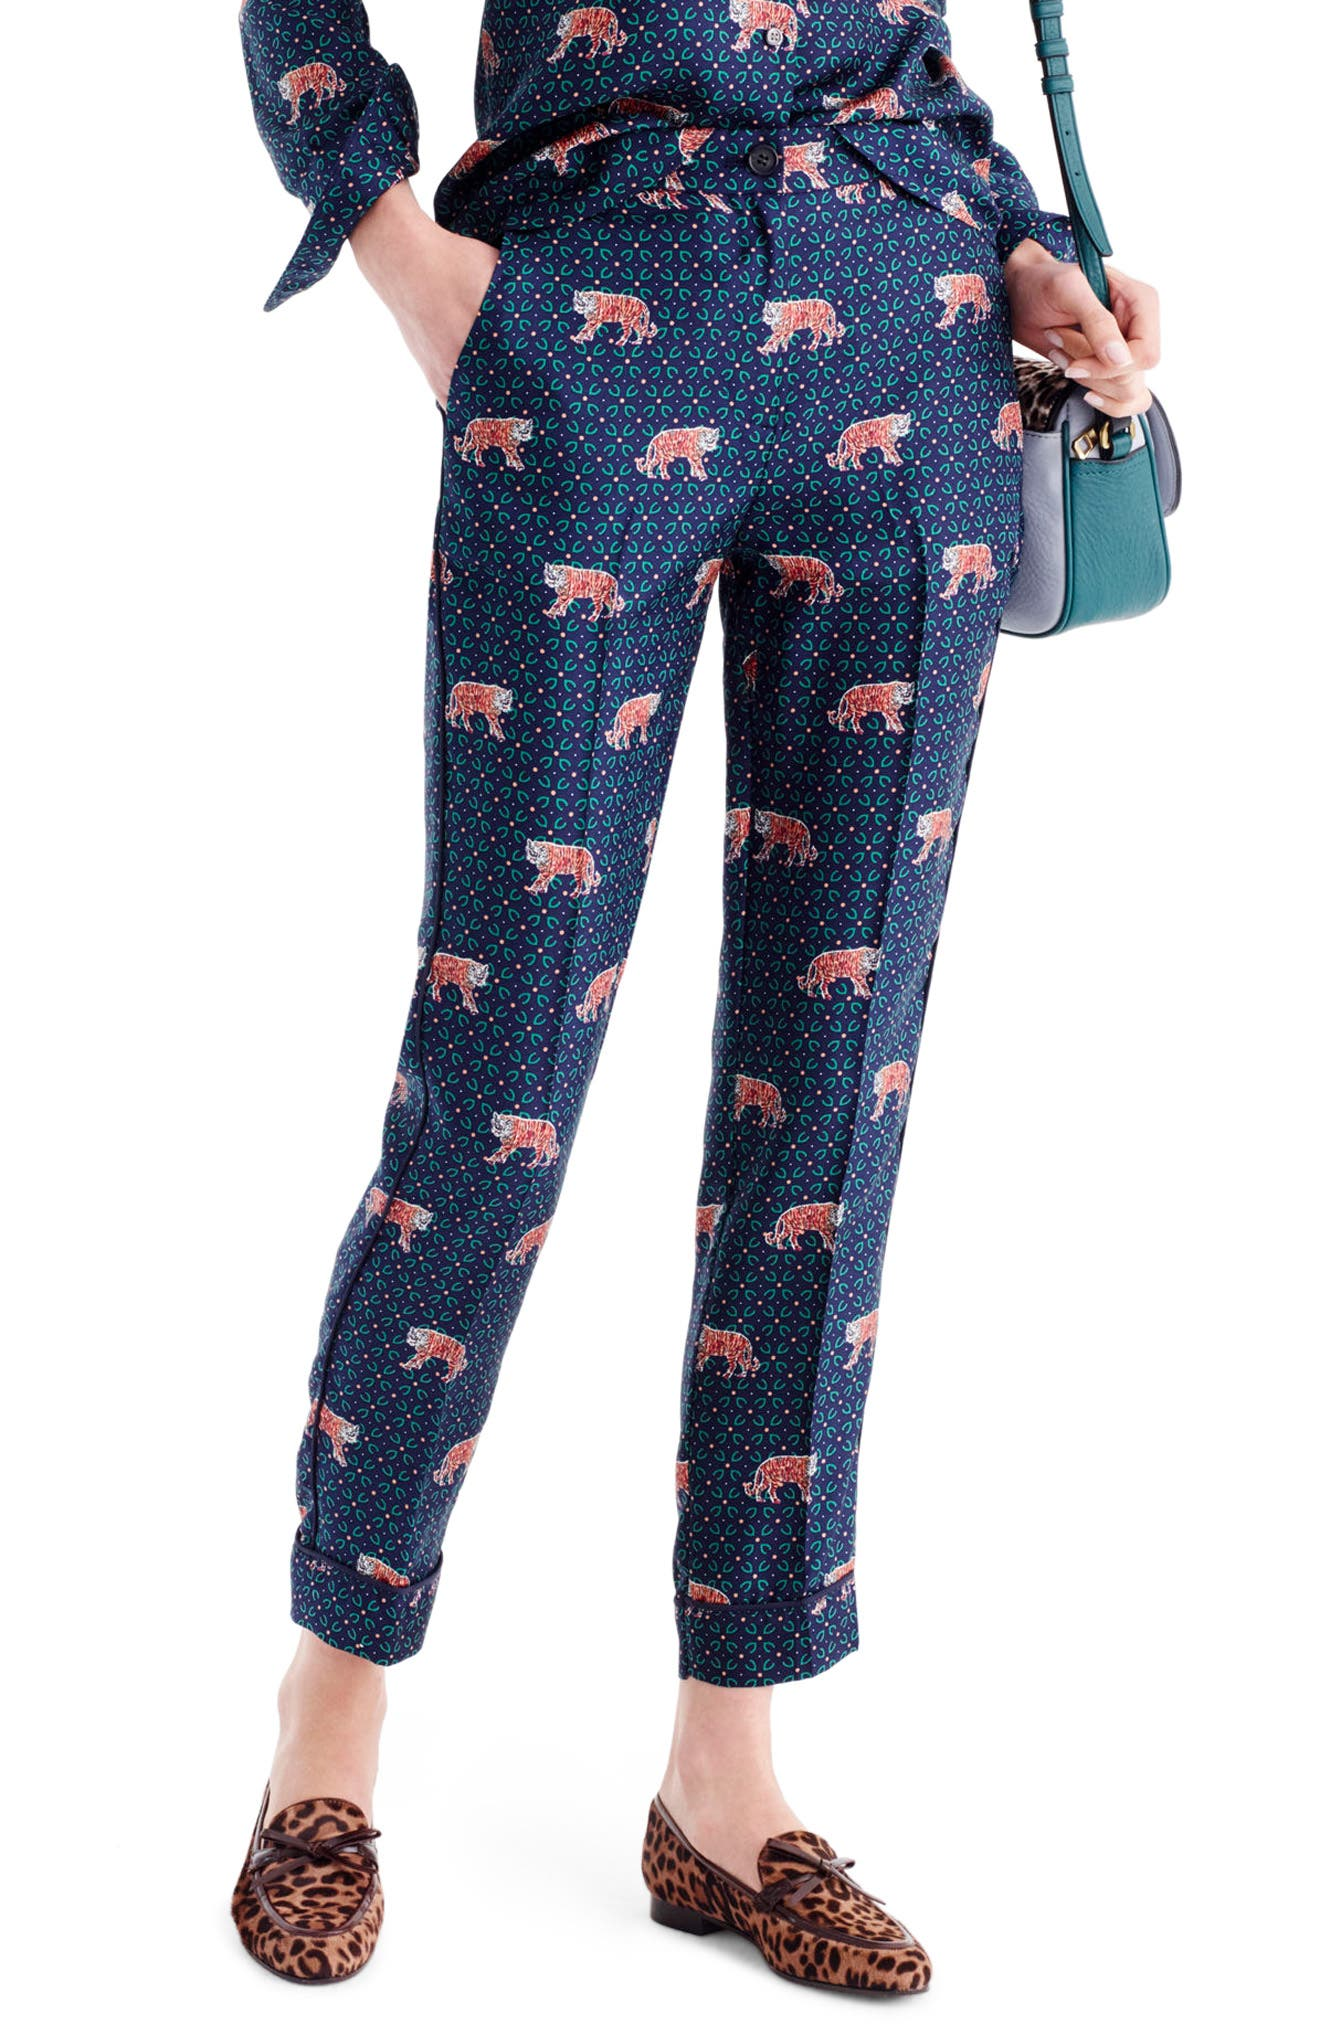 J.Crew Tiger Print Silk Easy Pants